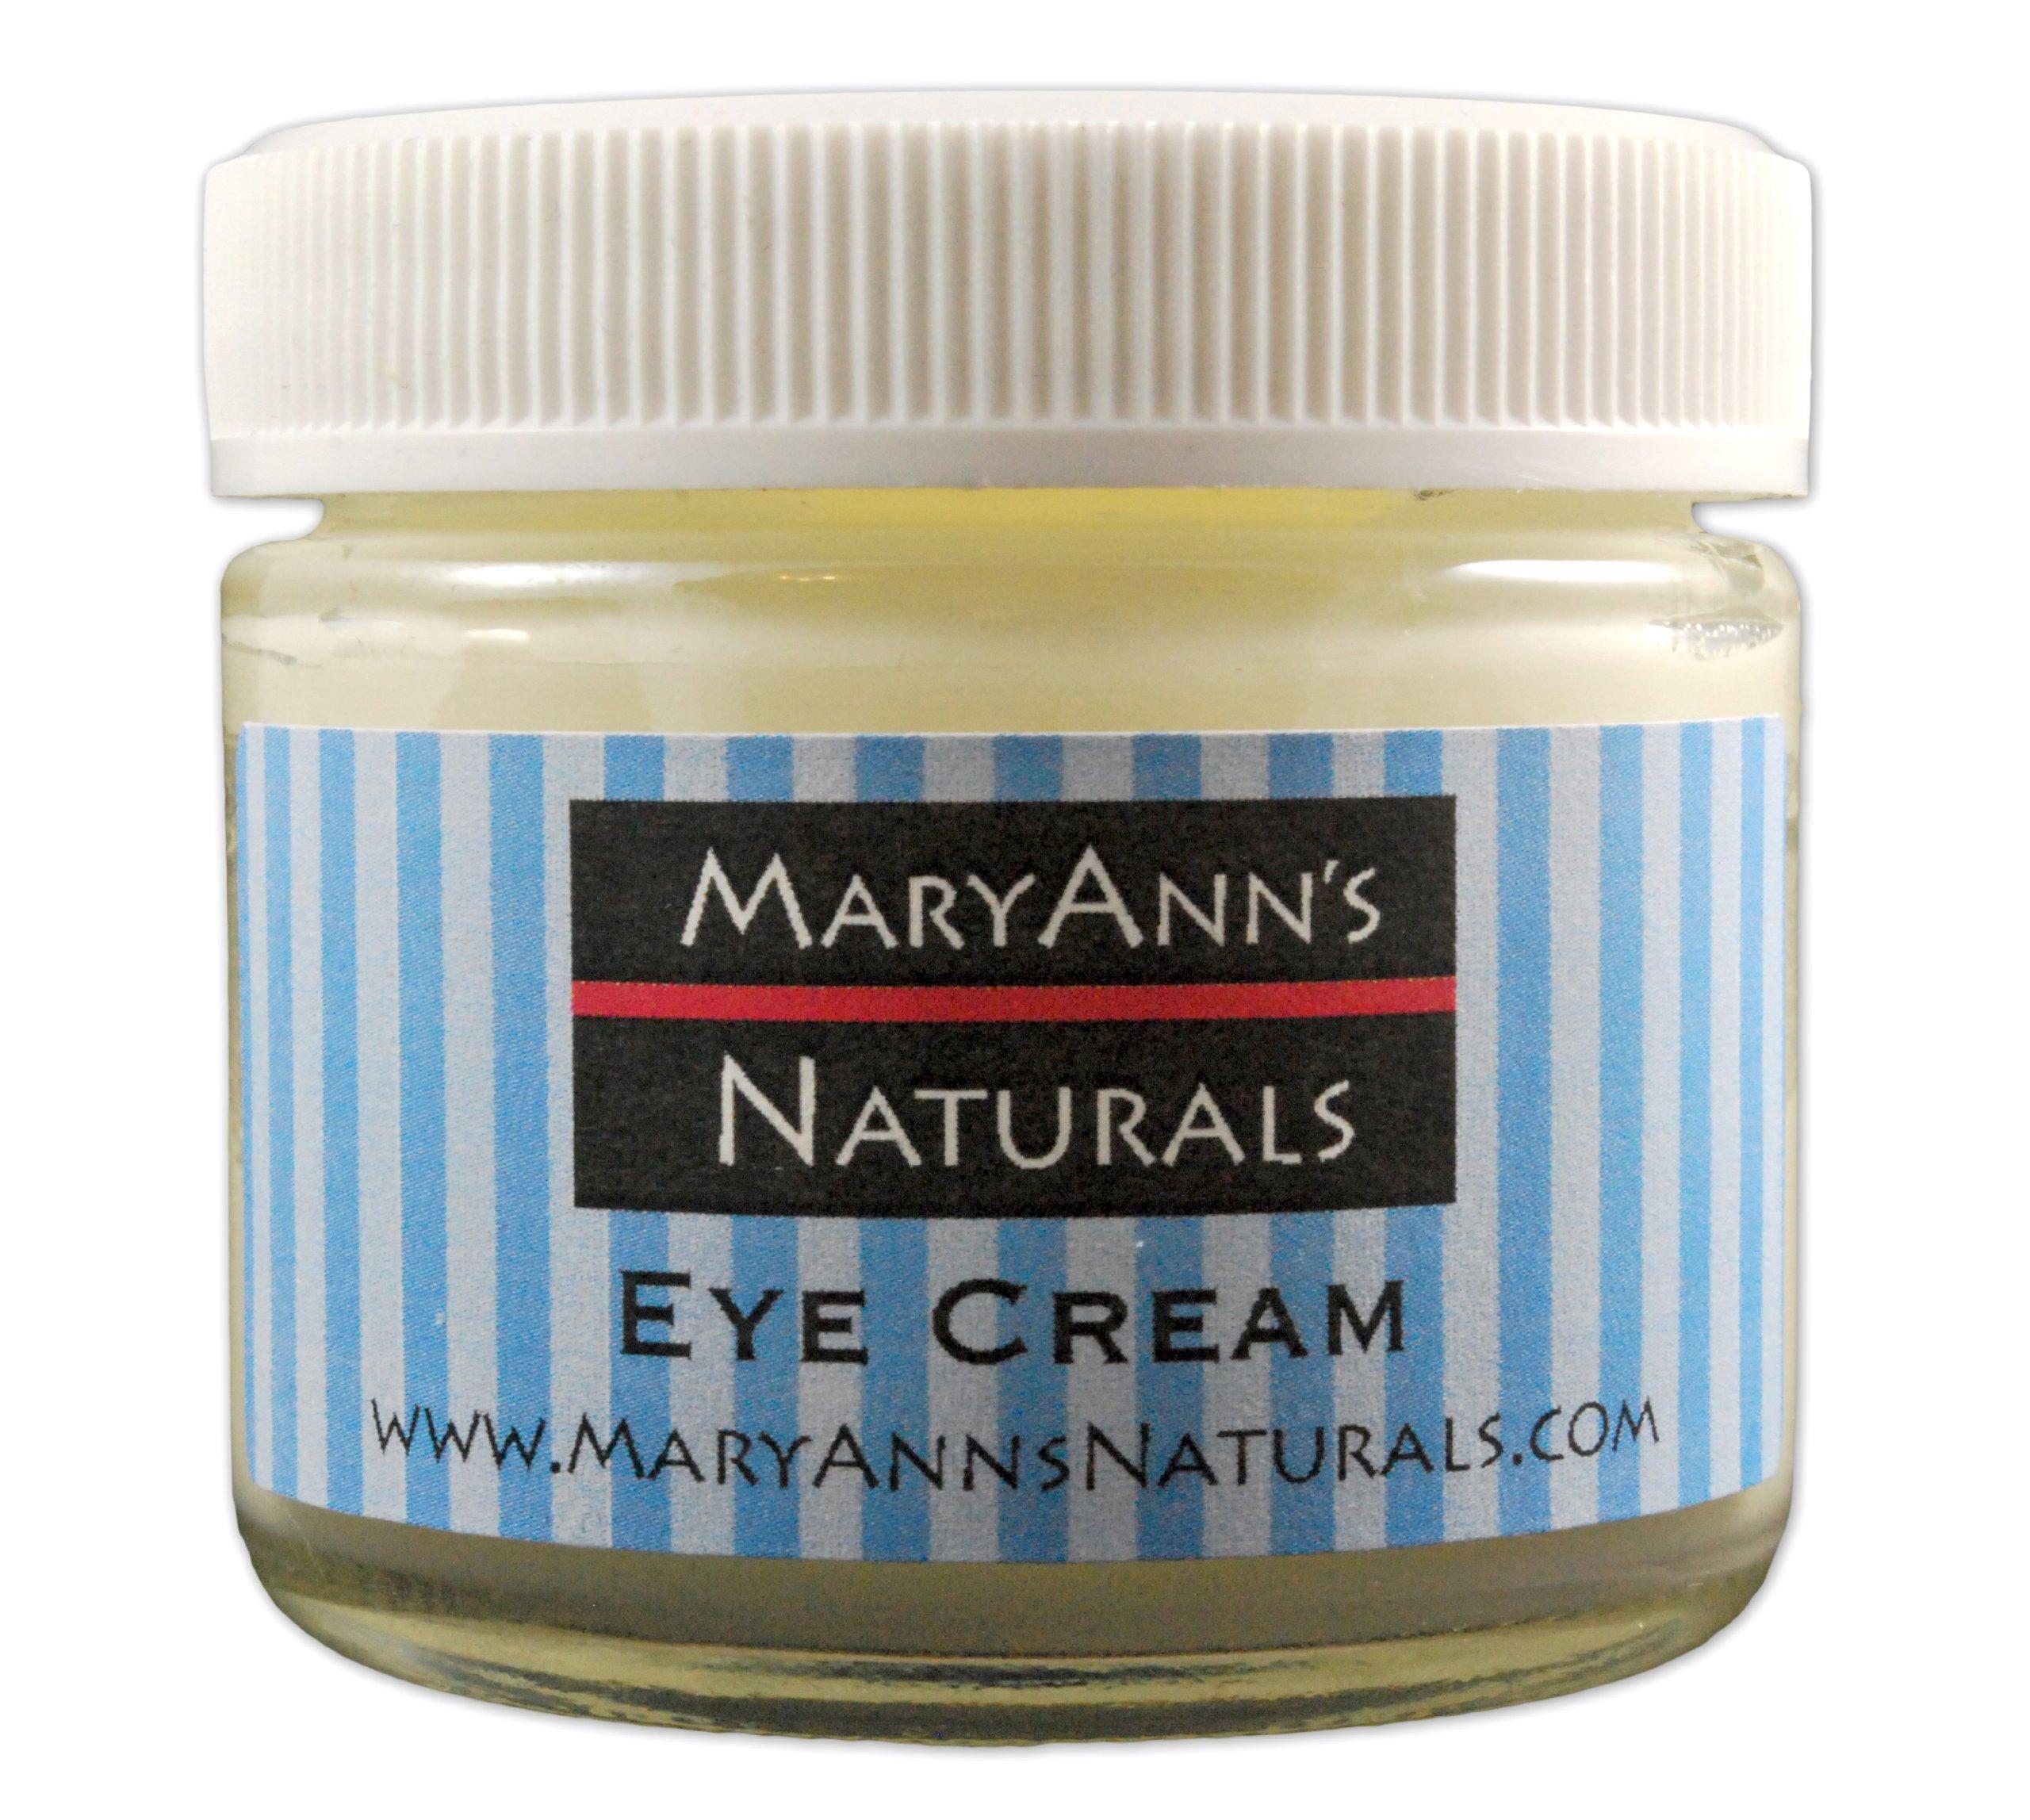 Mary Ann's Naturals Organic Handcrafted Eye Cream - 1 oz.